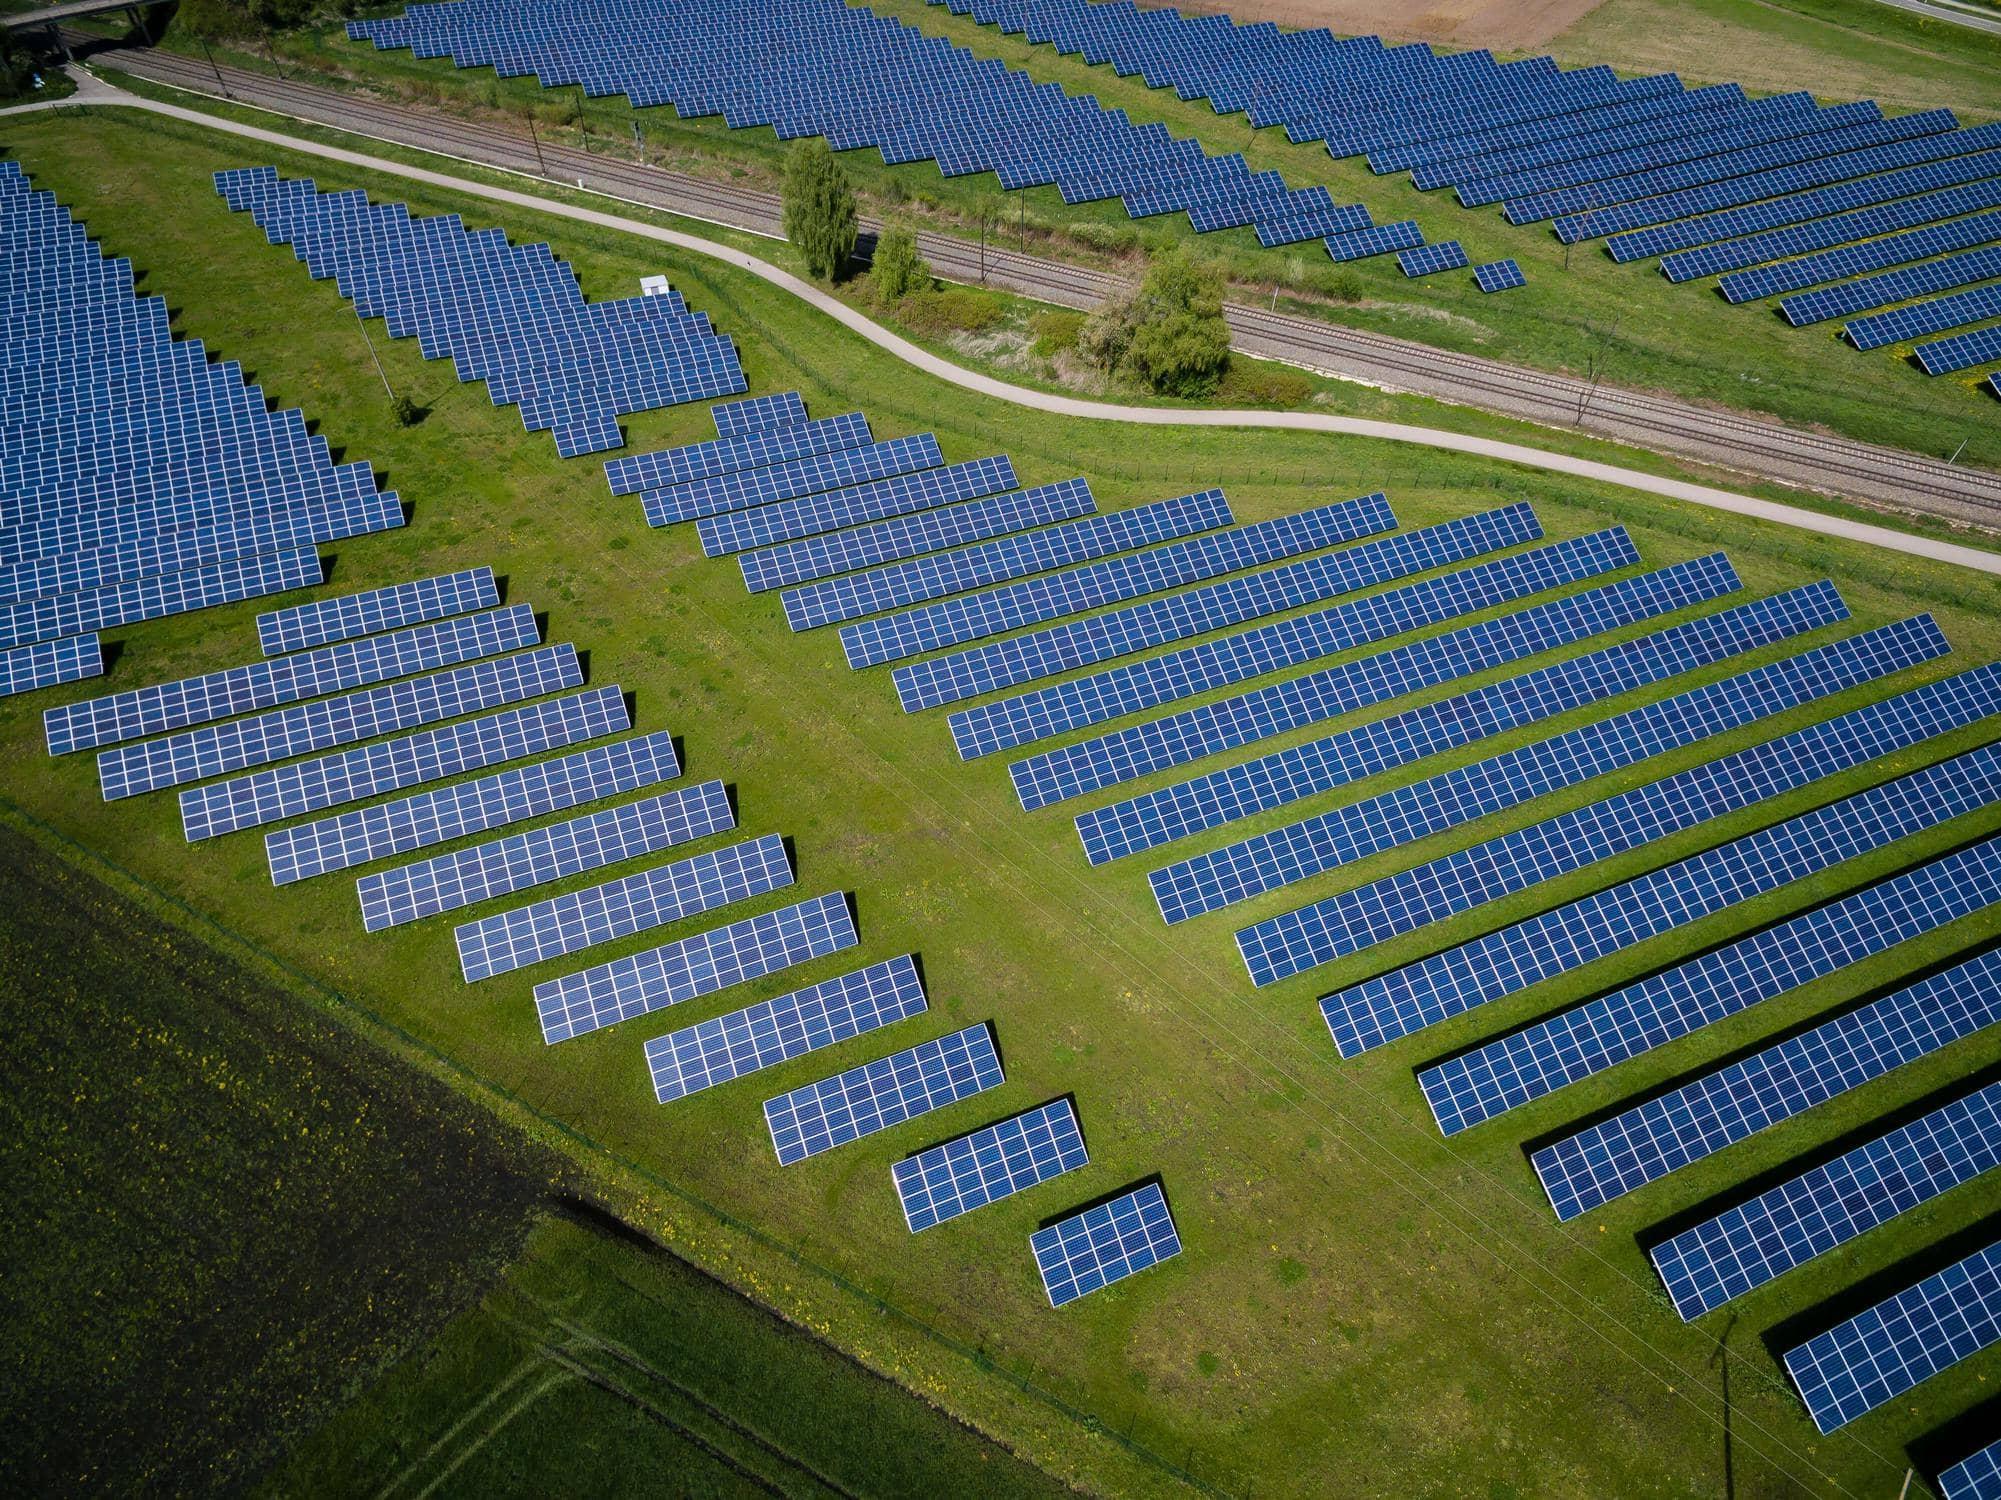 Solar panels auf einem Feld